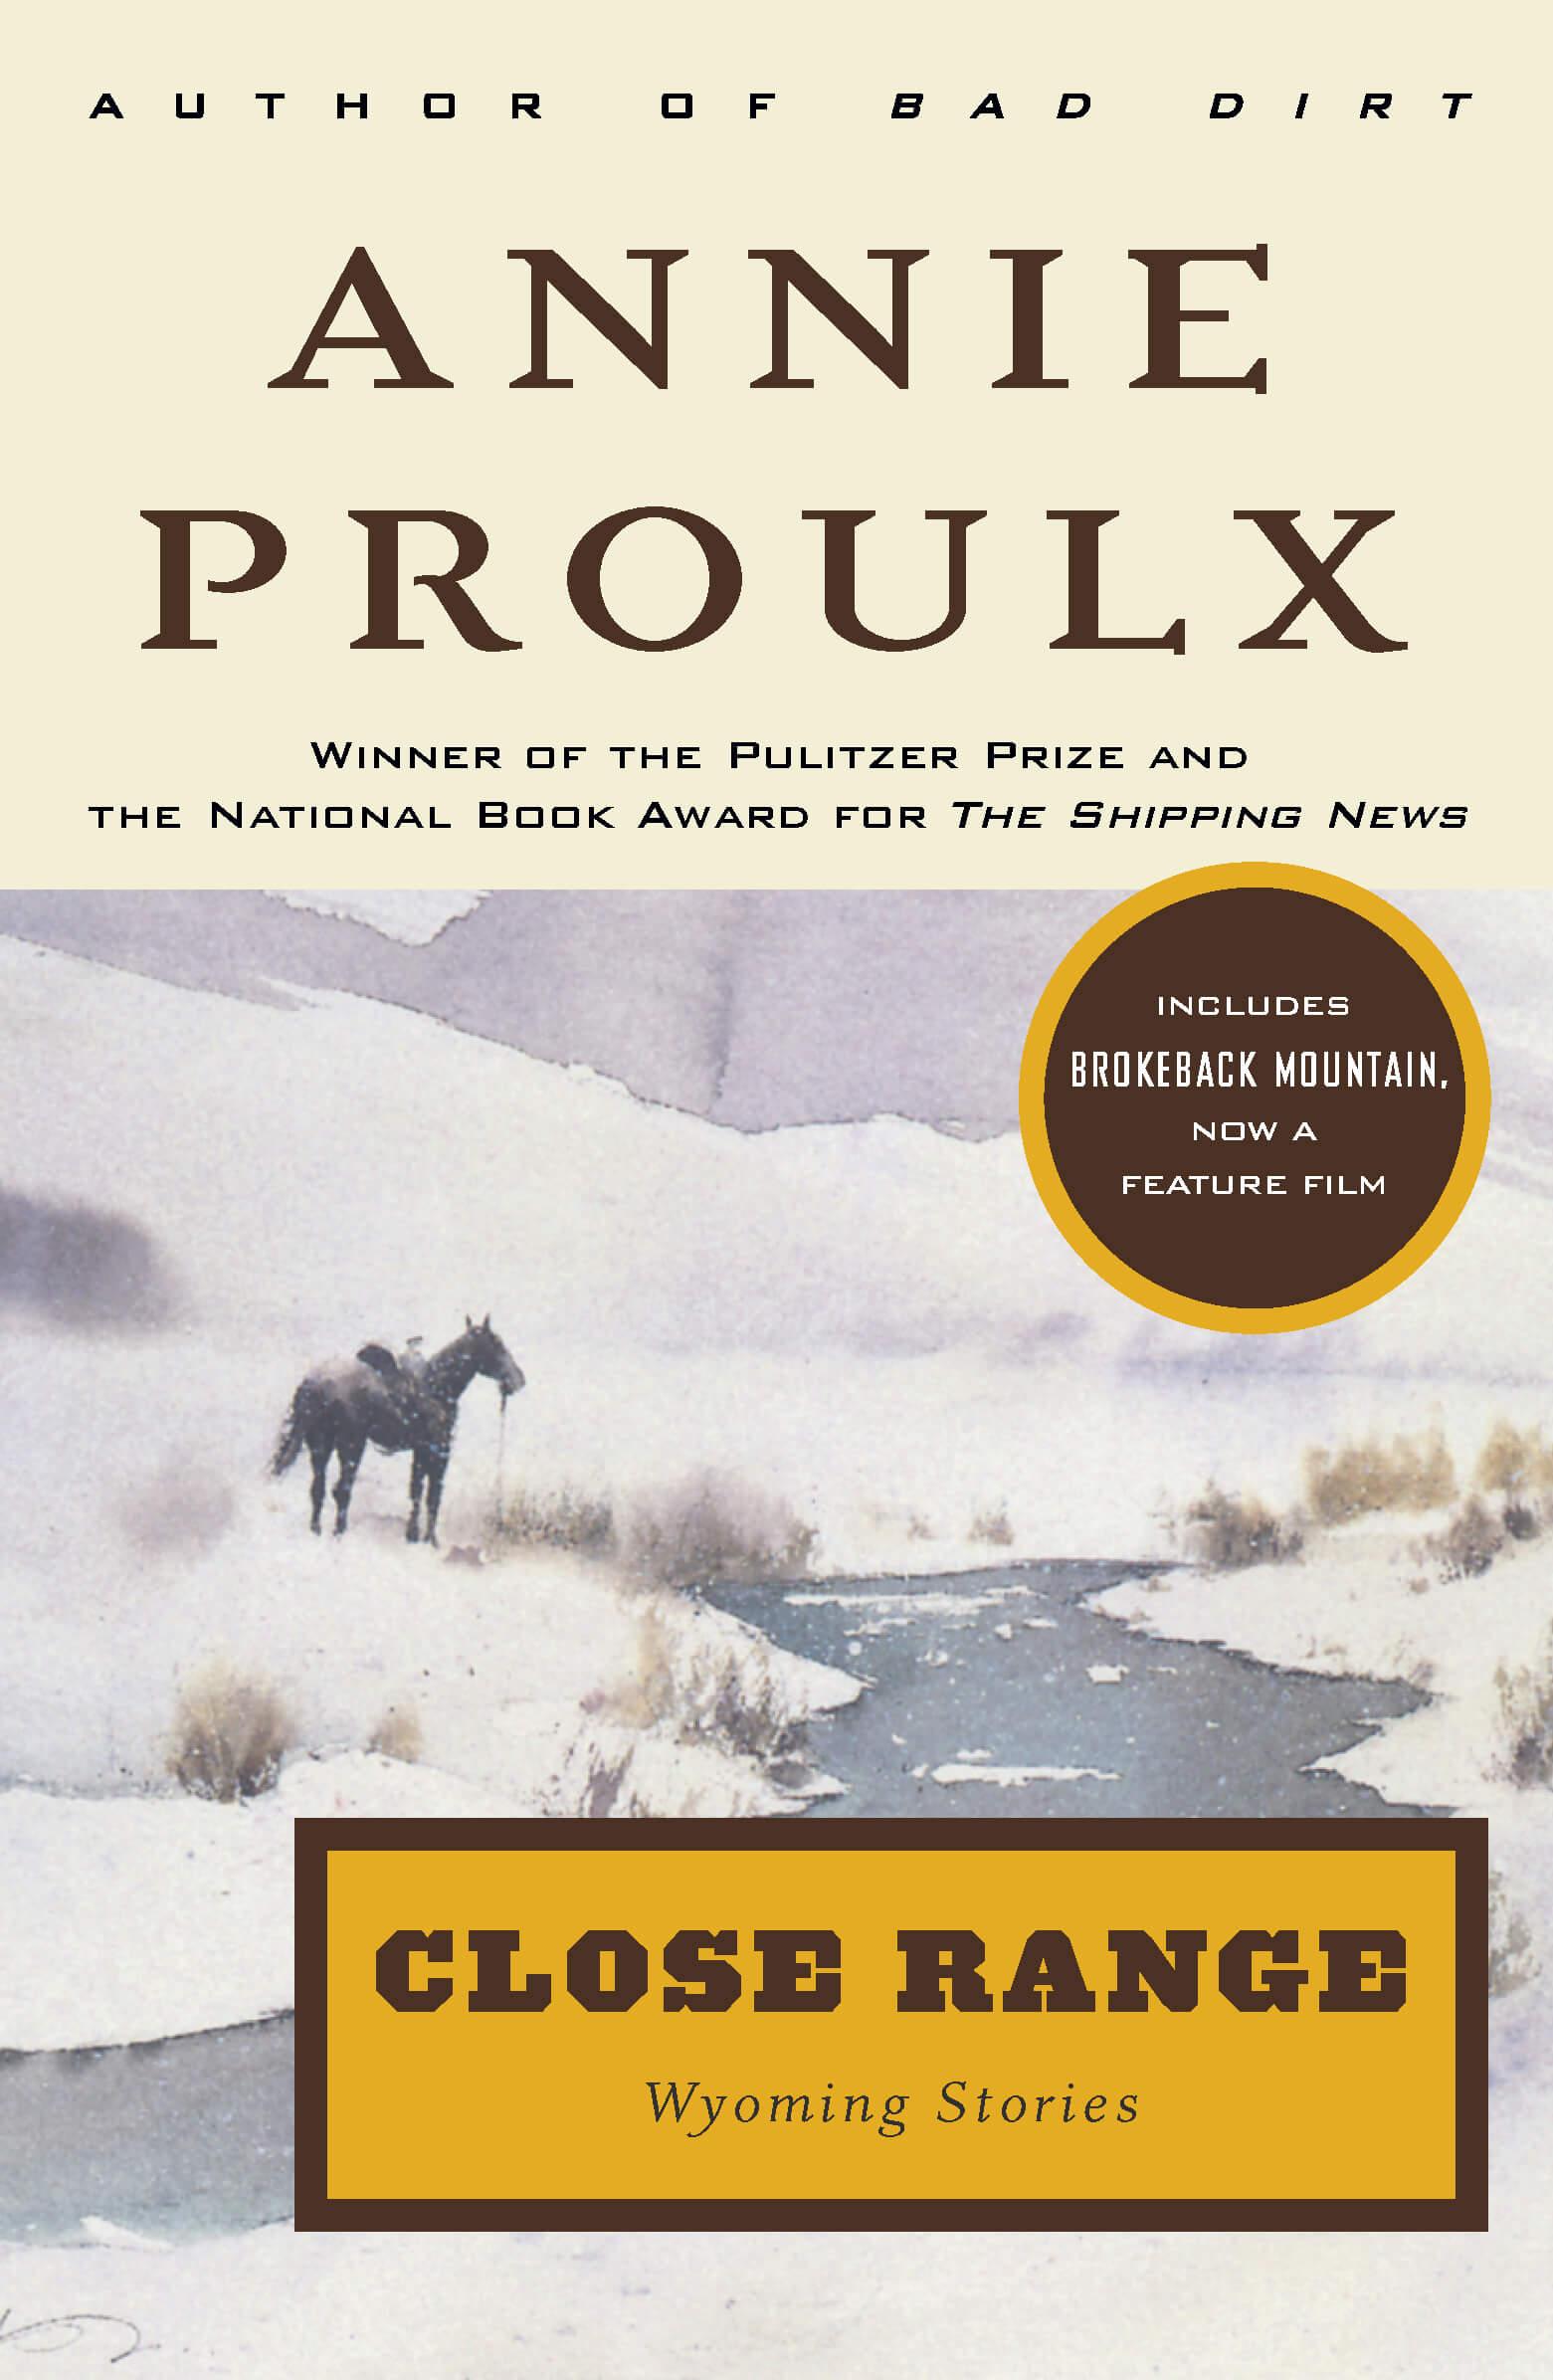 Close Range book cover image